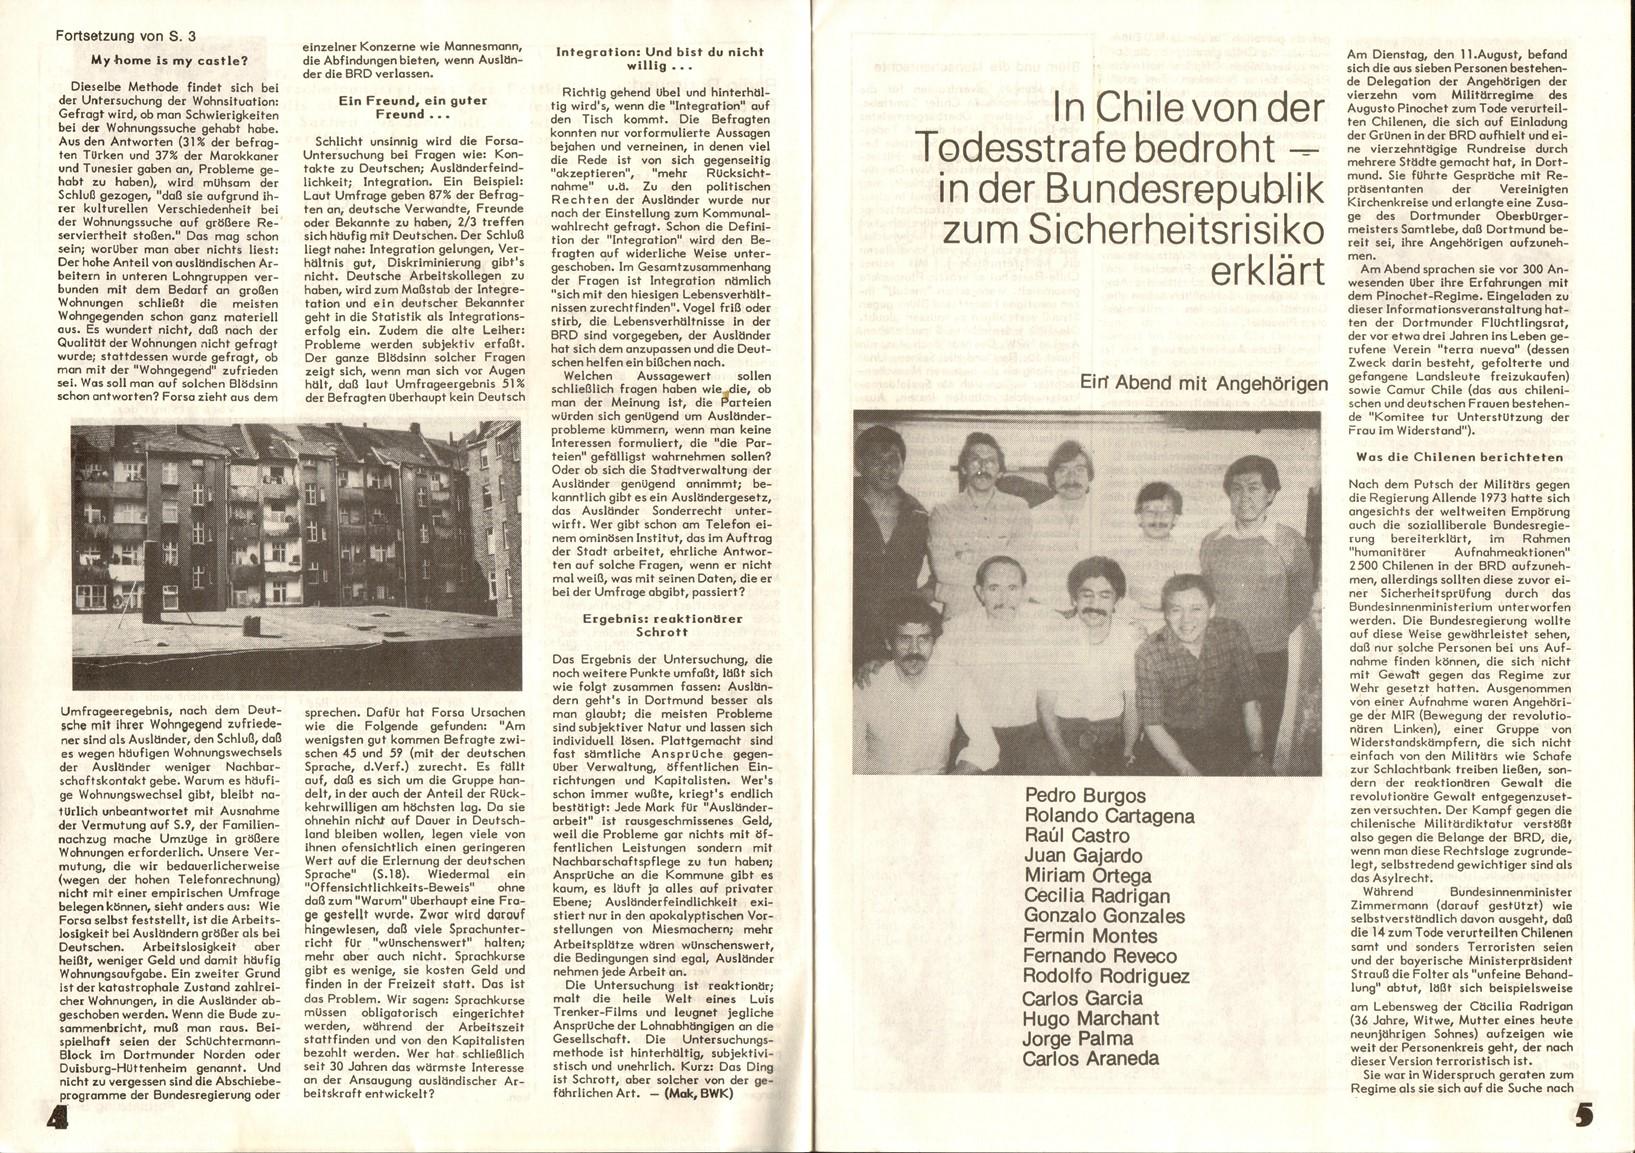 Dortmund_Pottkieker_19870900_03